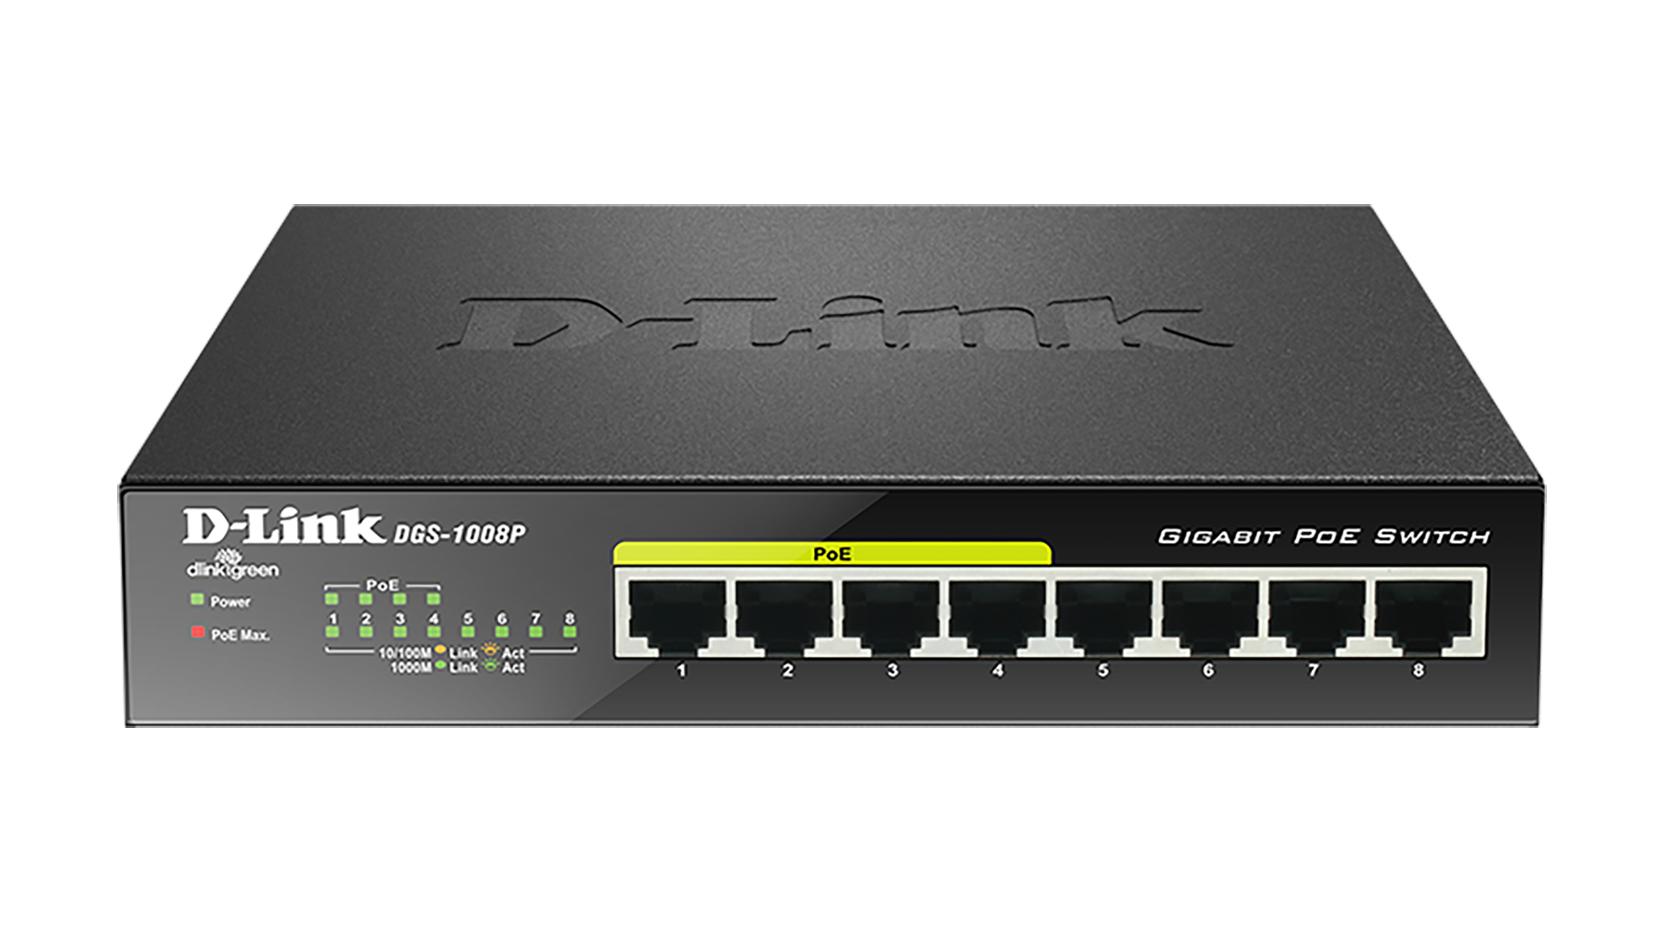 D-Link DGS-1008P switch No administrado Gigabit Ethernet (10/100/1000) Negro Energía sobre Ethernet (PoE)